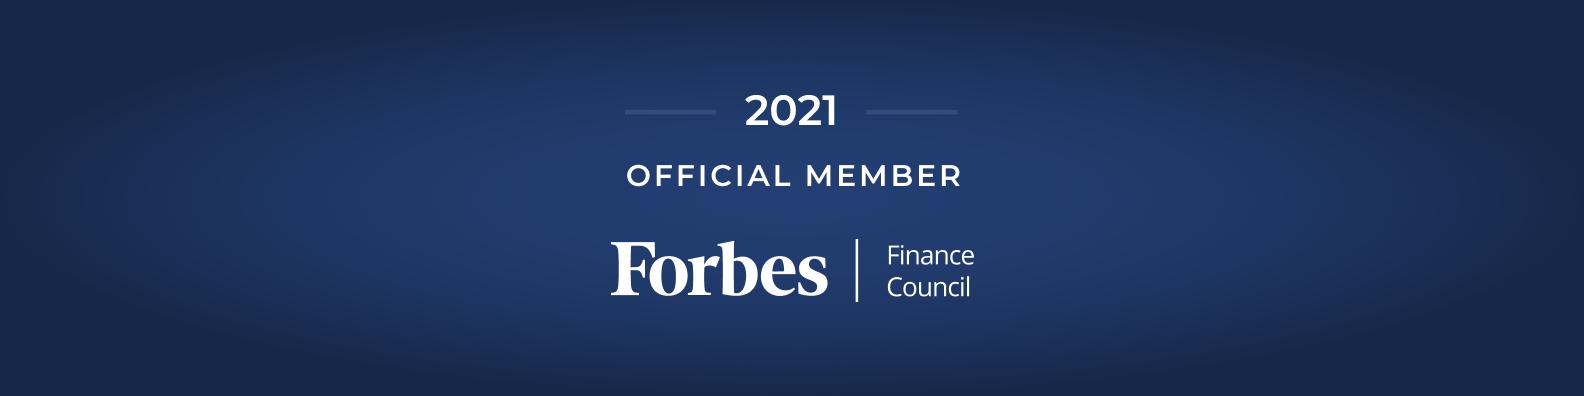 FFC-Social-LinkedIn-Cover-2021